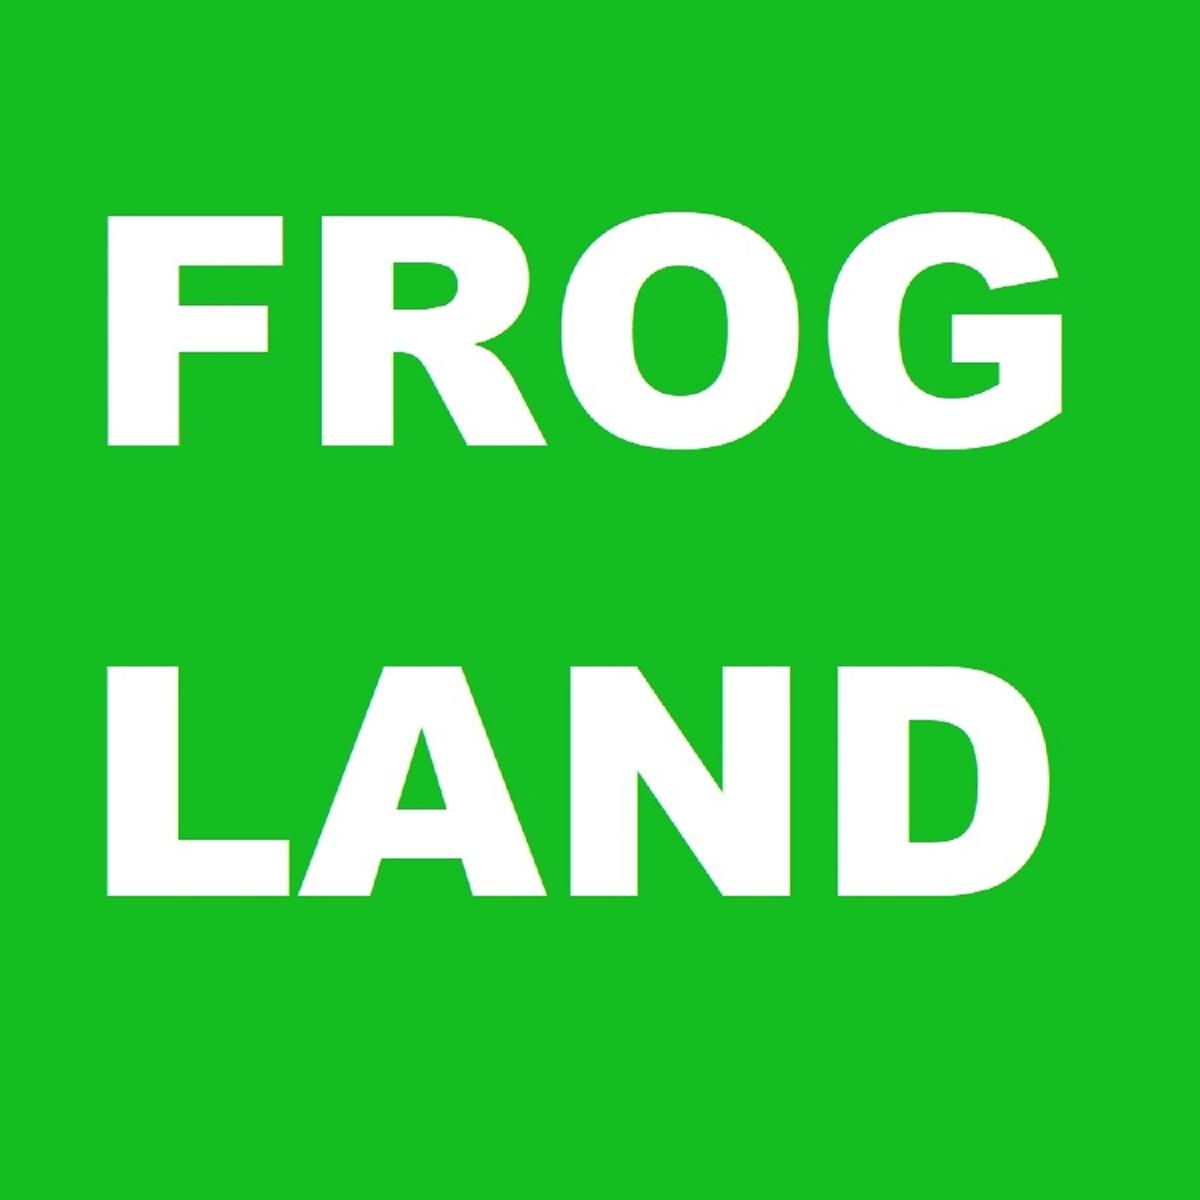 Frogland.org